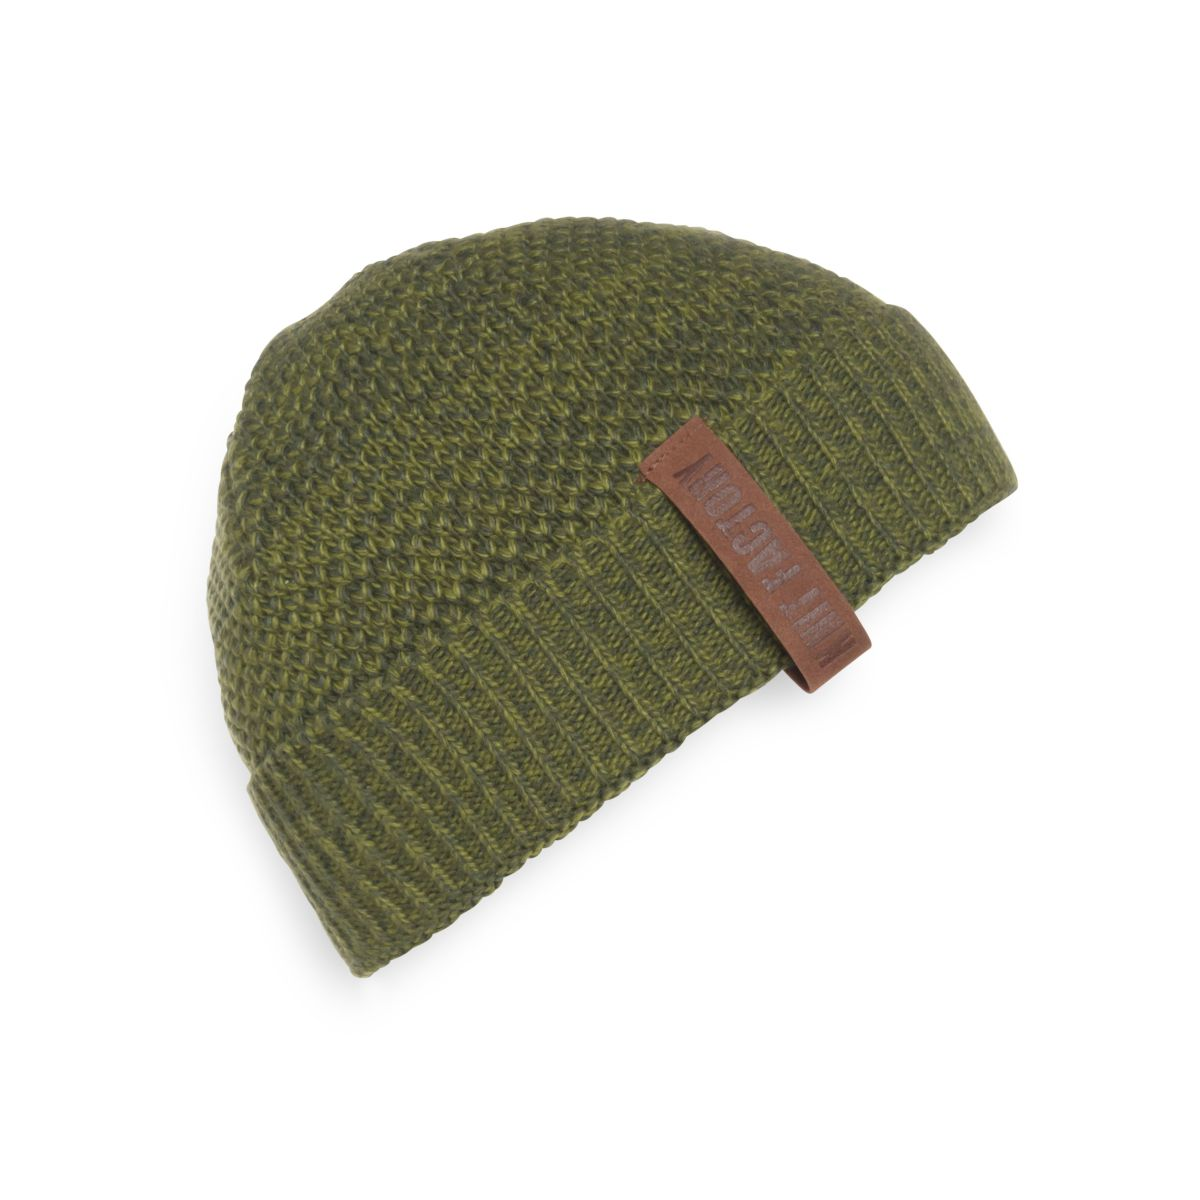 knit factory kf12307008550 jazz muts mosgroen khaki 1